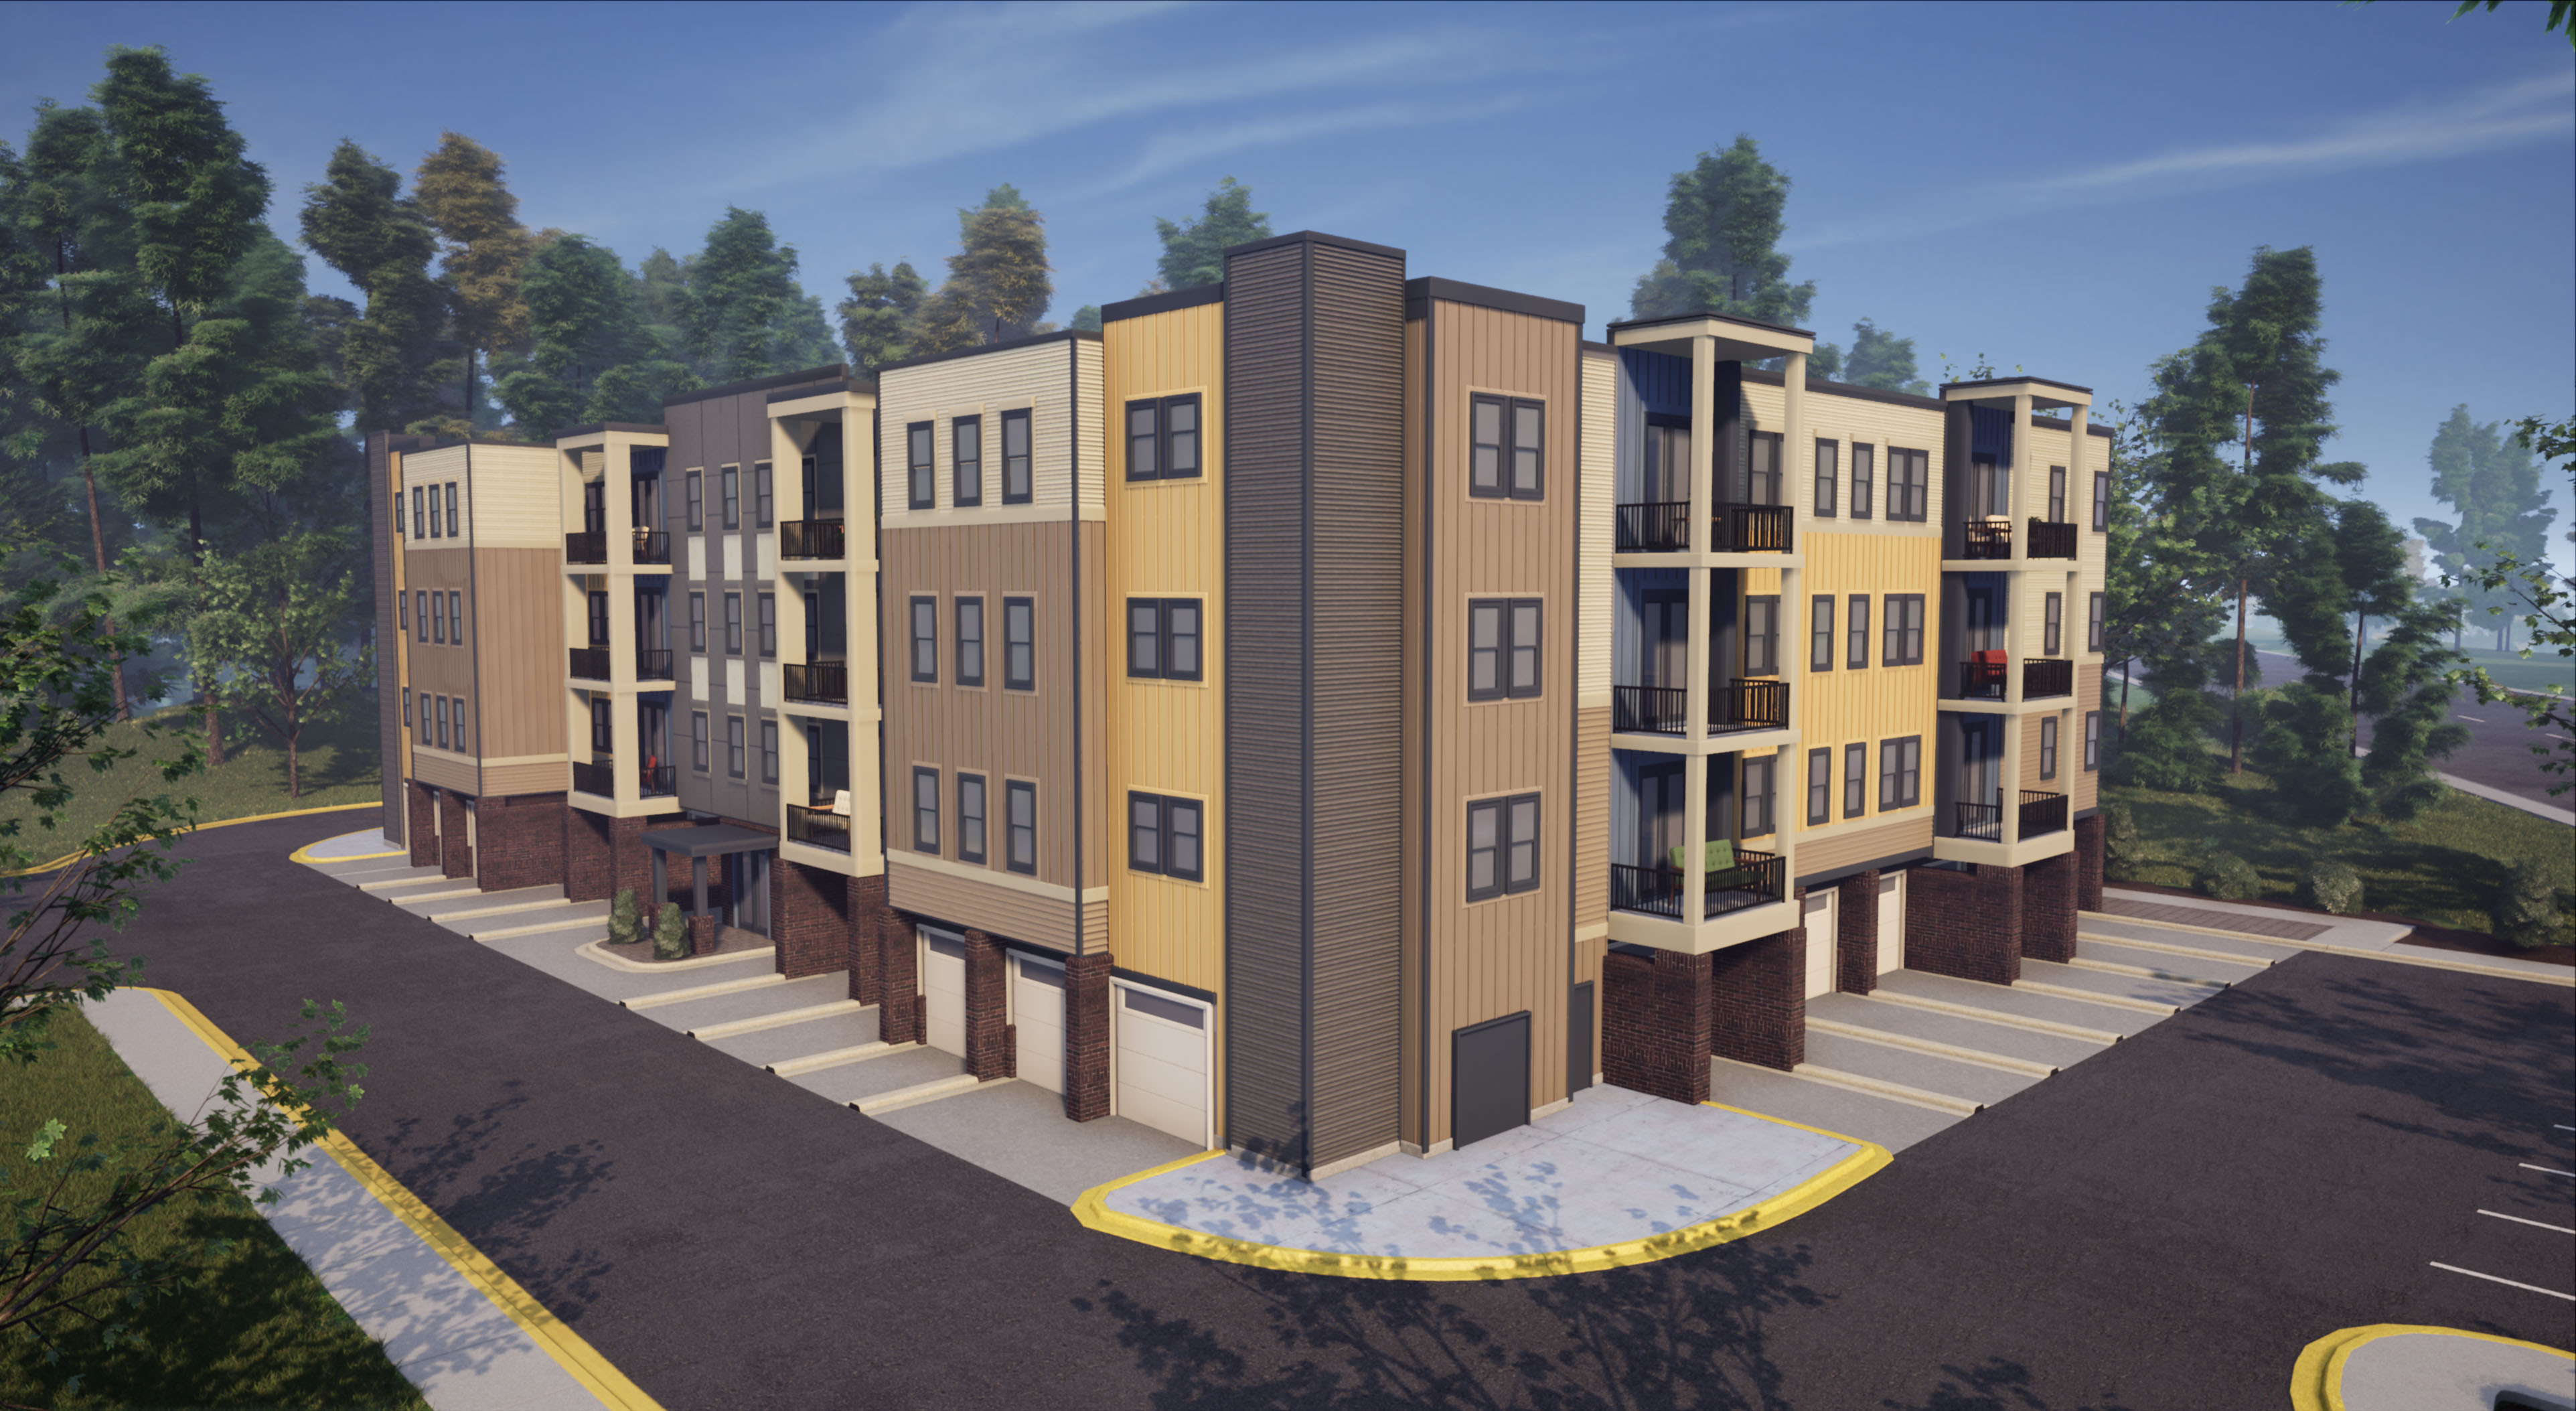 Condominium for Sale at The Signature - Van Metre Homes-Building 1 - The Gill 43045 Van Metre Drive, Suite 175 Ashburn, Virginia 20148 United States